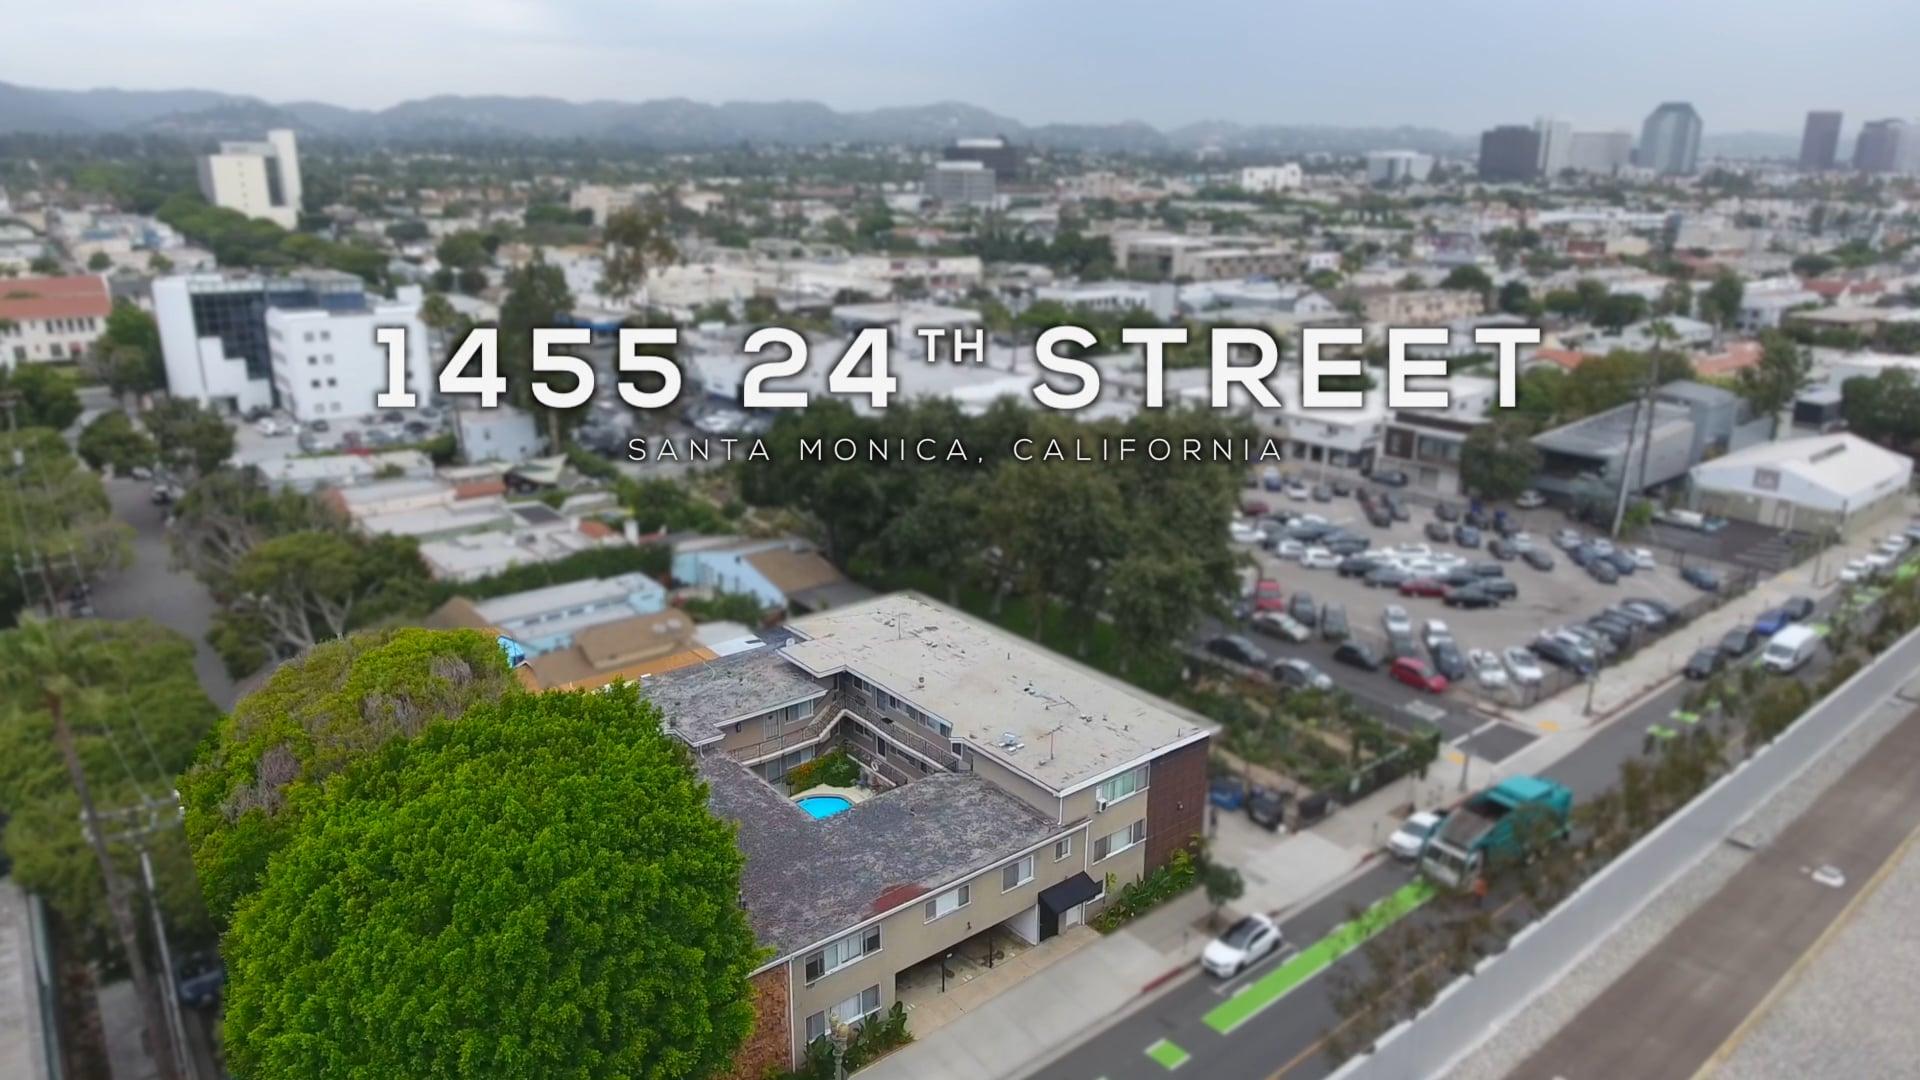 1455 24th St, Santa Monica, CA 90404